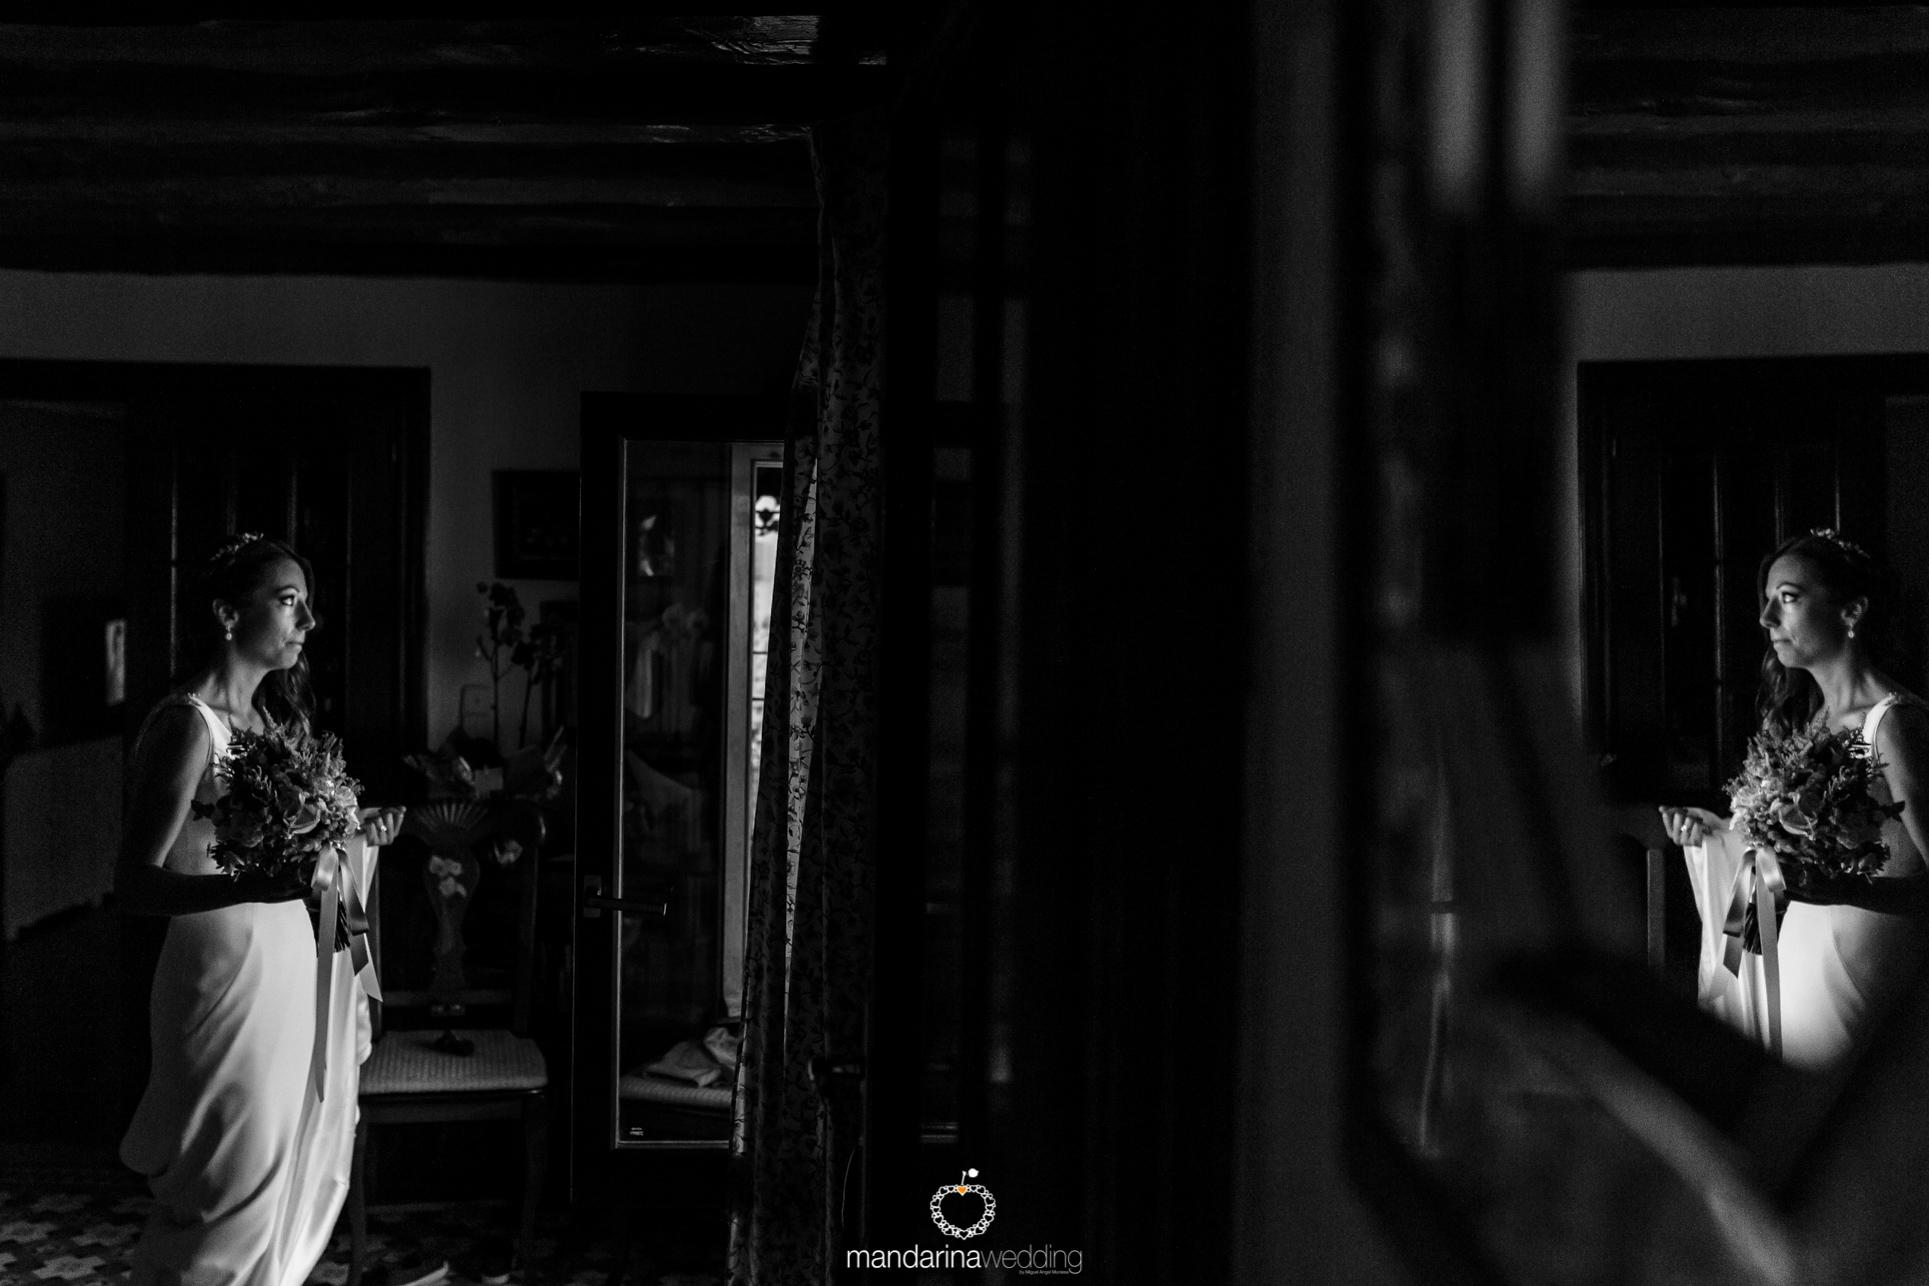 mandarina wedding, fotografo boda pais vasco, fotografo boda zaragoza, fotógrafo boda soria, fotografo boda Madrid, fotógrafo boda tarragona-15